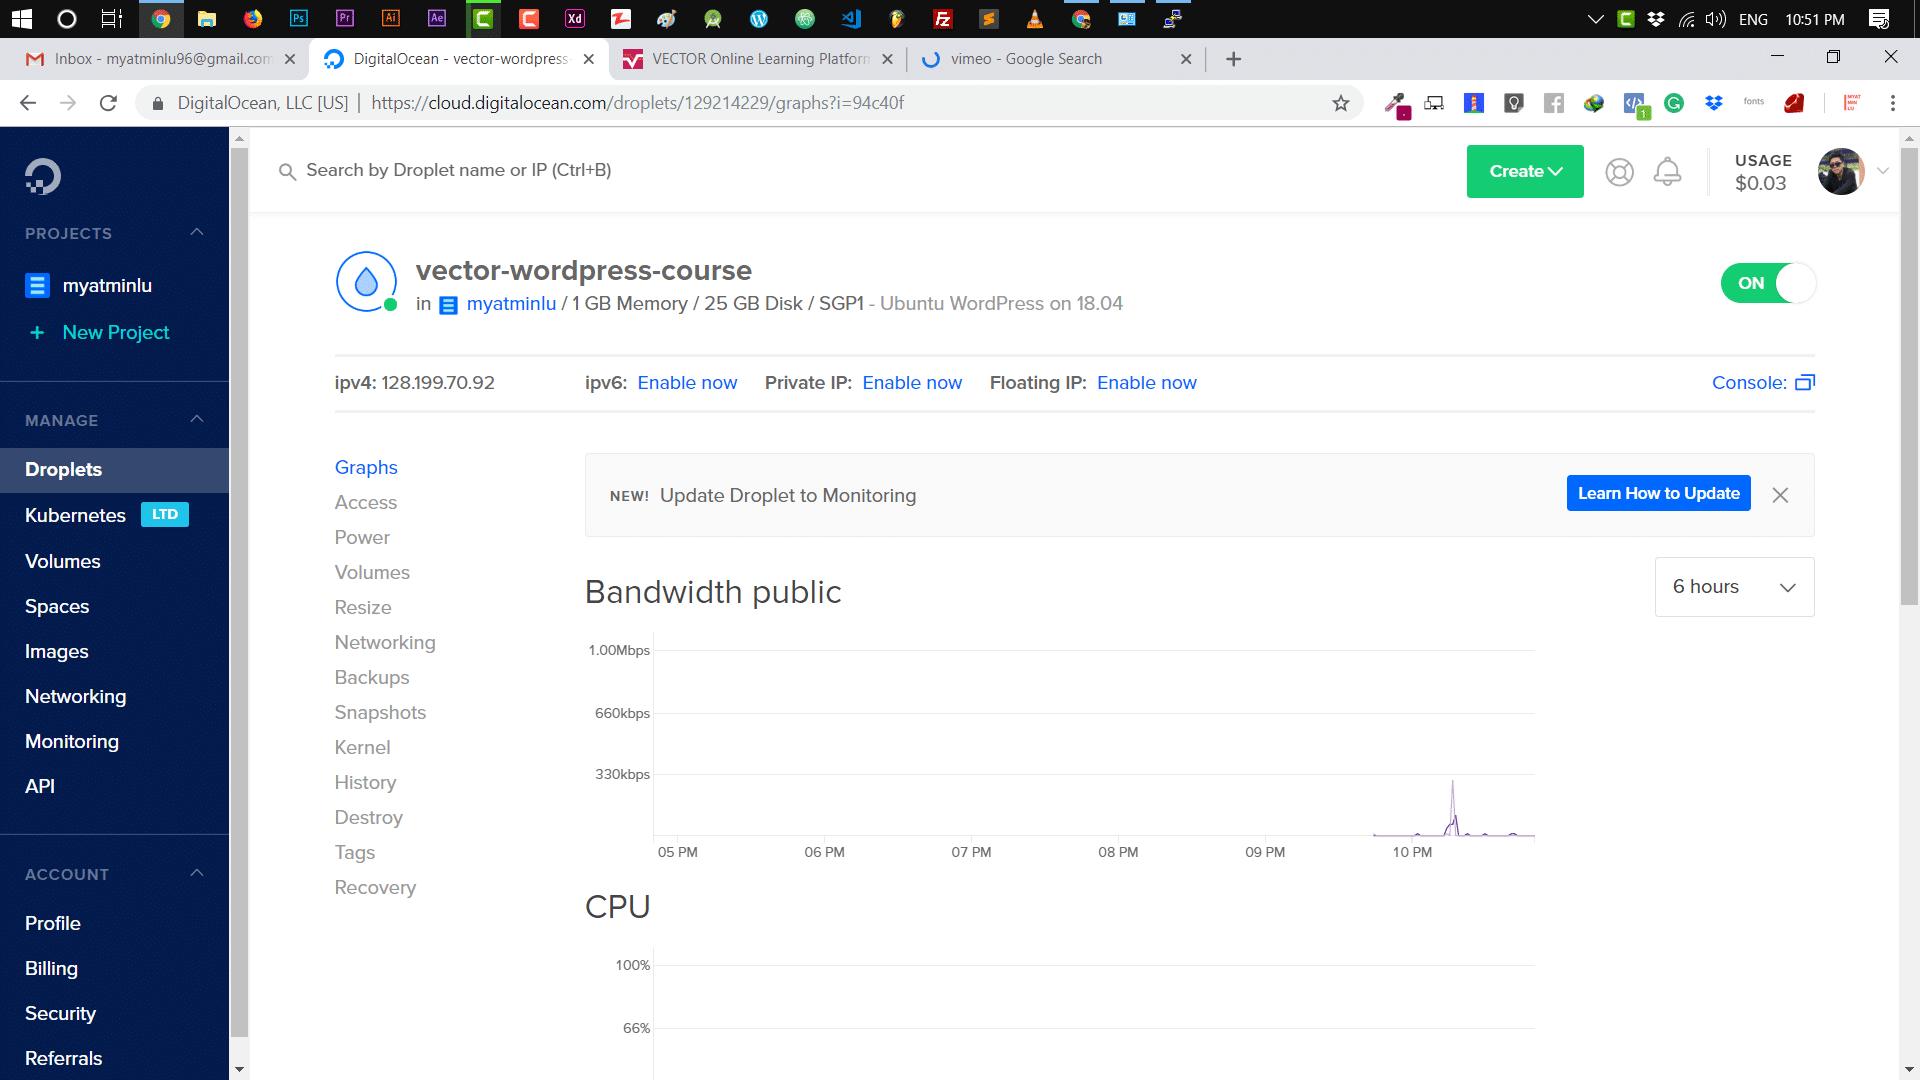 WordPress ကို Digital Ocean တွင် Install နှင့် Setup လုပ်ခြင်း